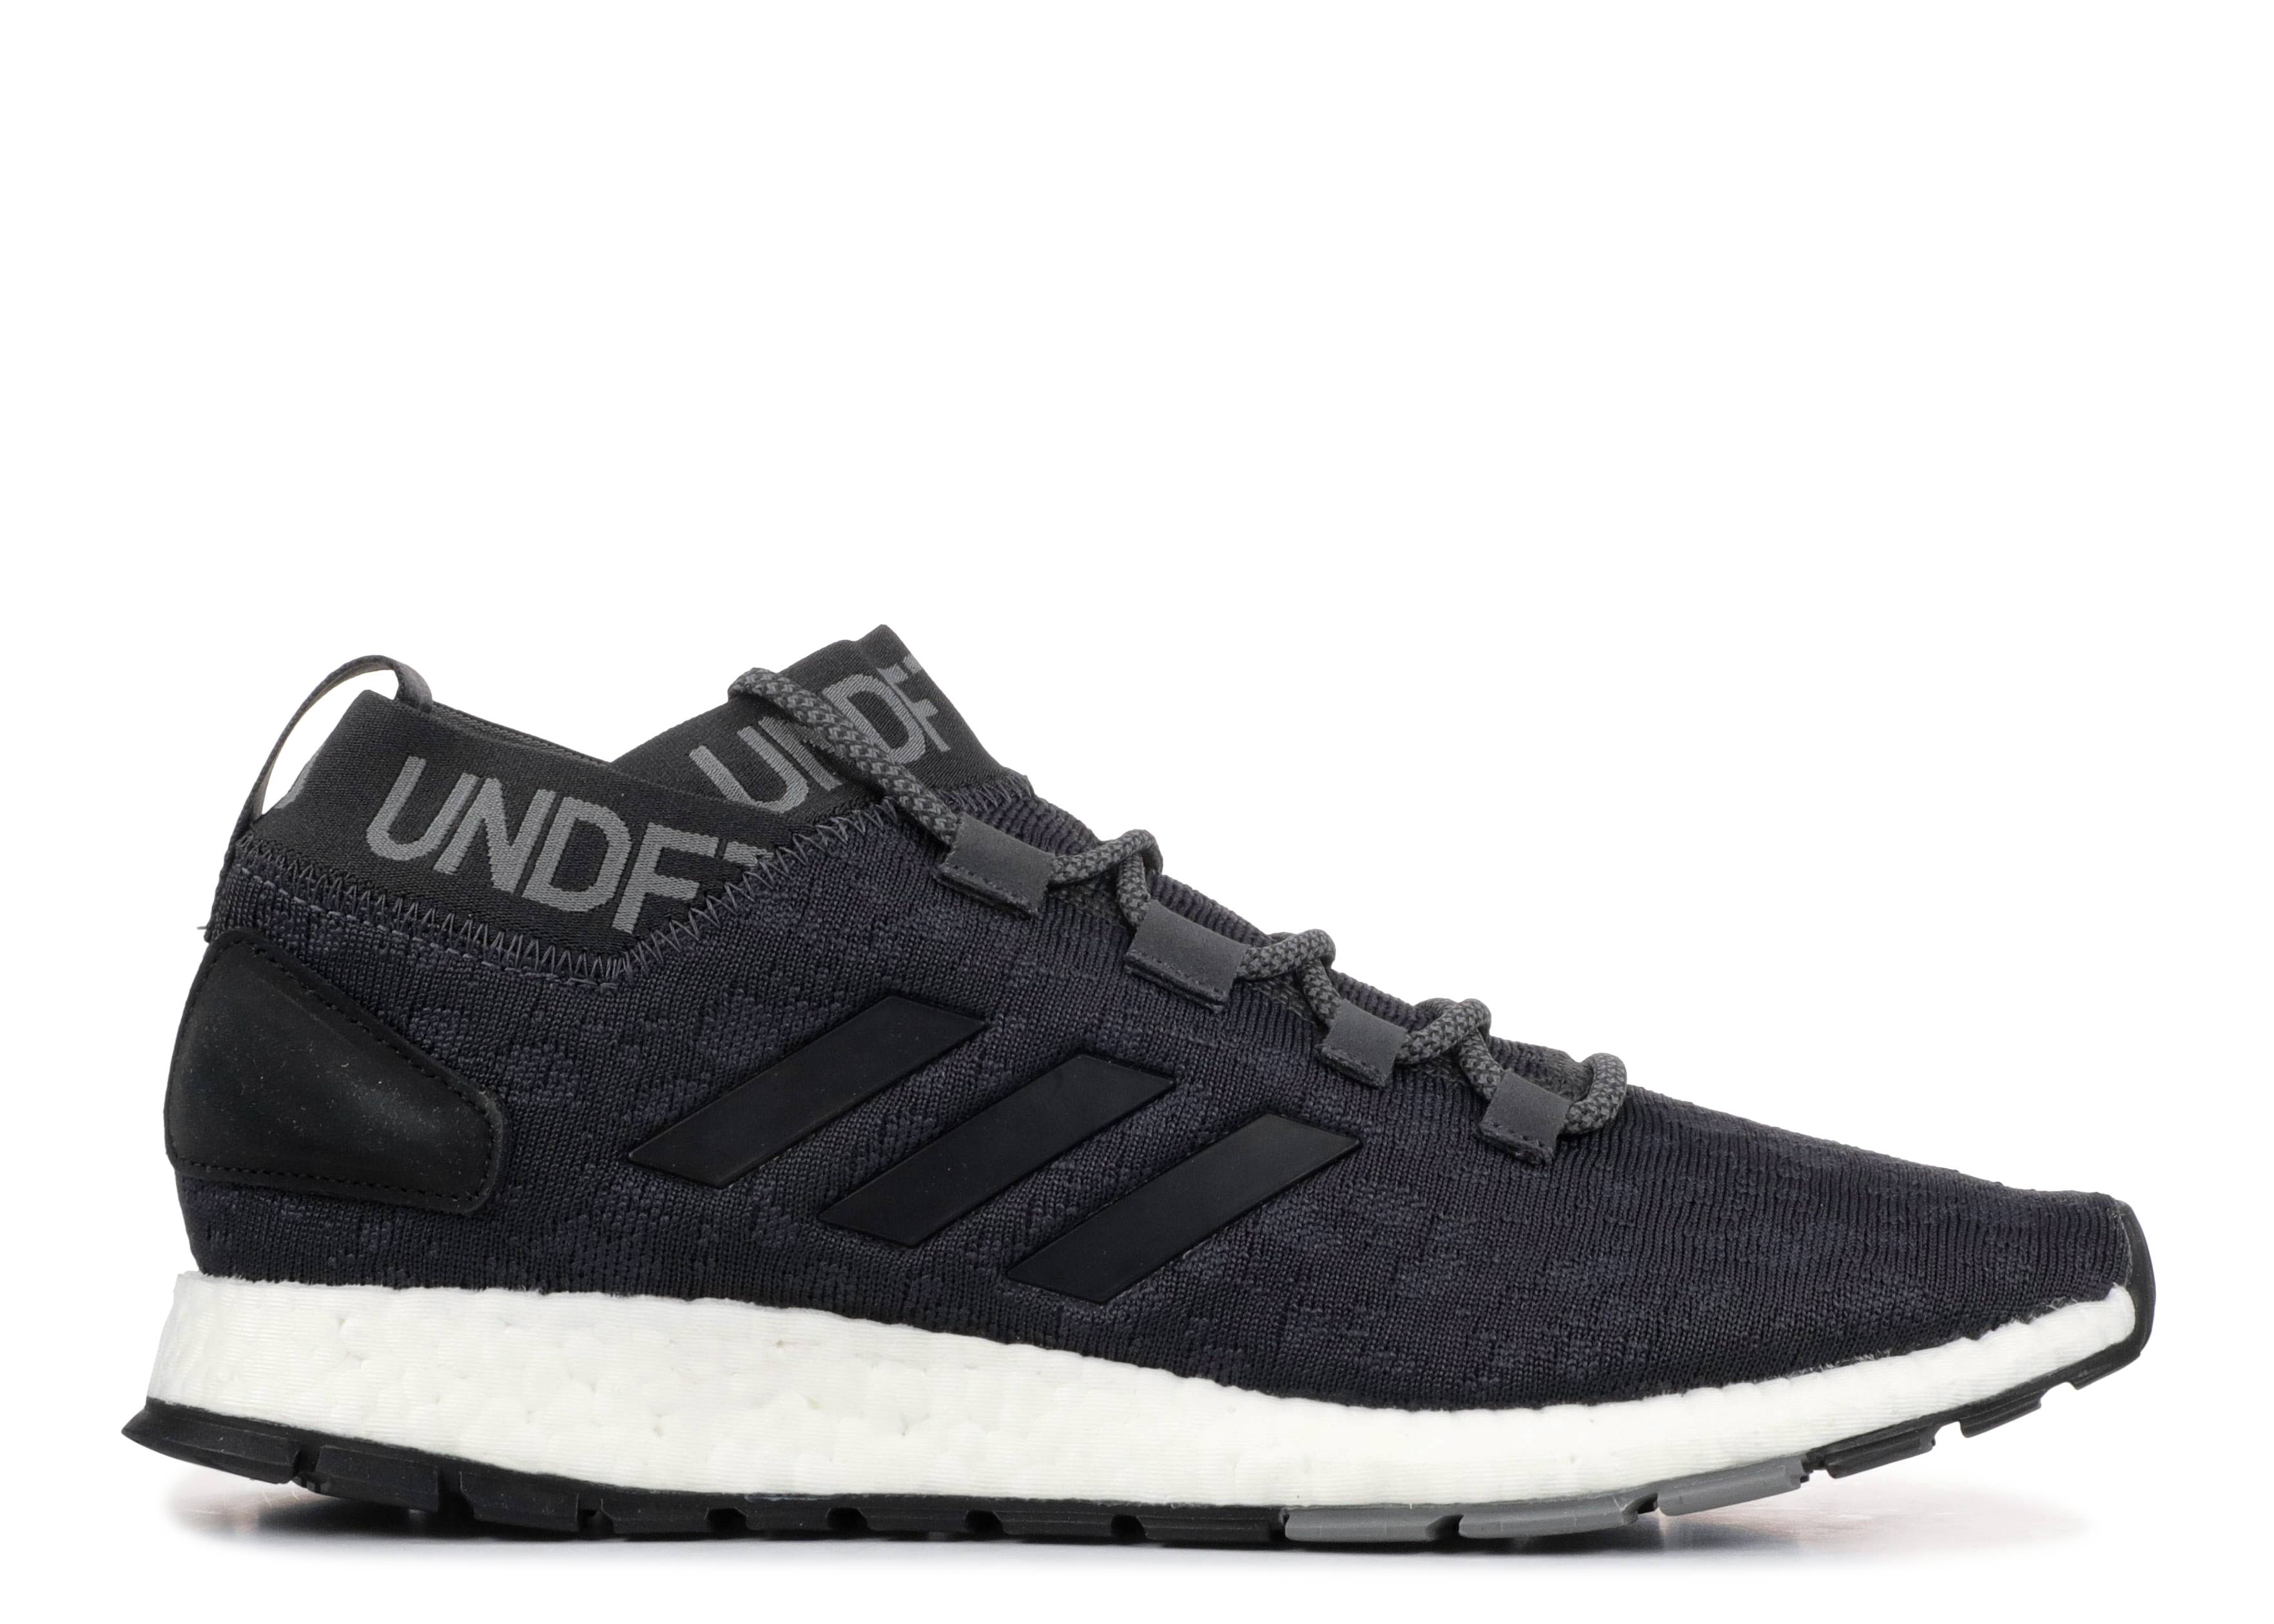 ConceptsIntl | adidas X UNDFTD Run Crew (Cinder)